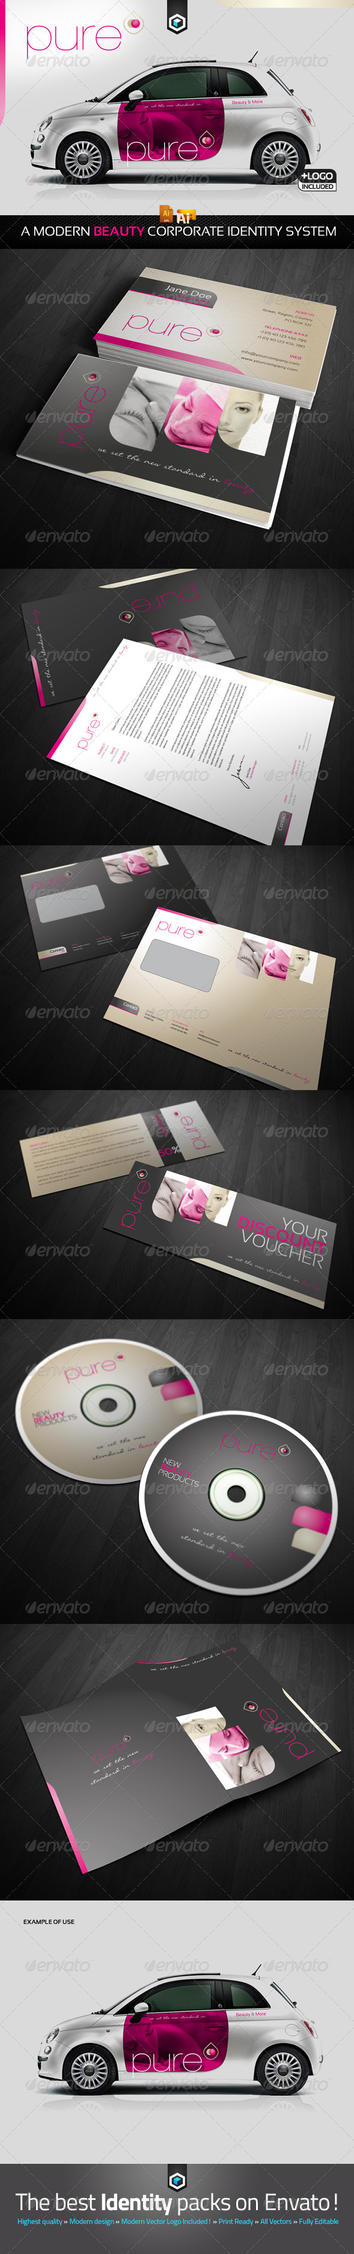 RW Beauty Salon Corporate Identity V2 by Reclameworks